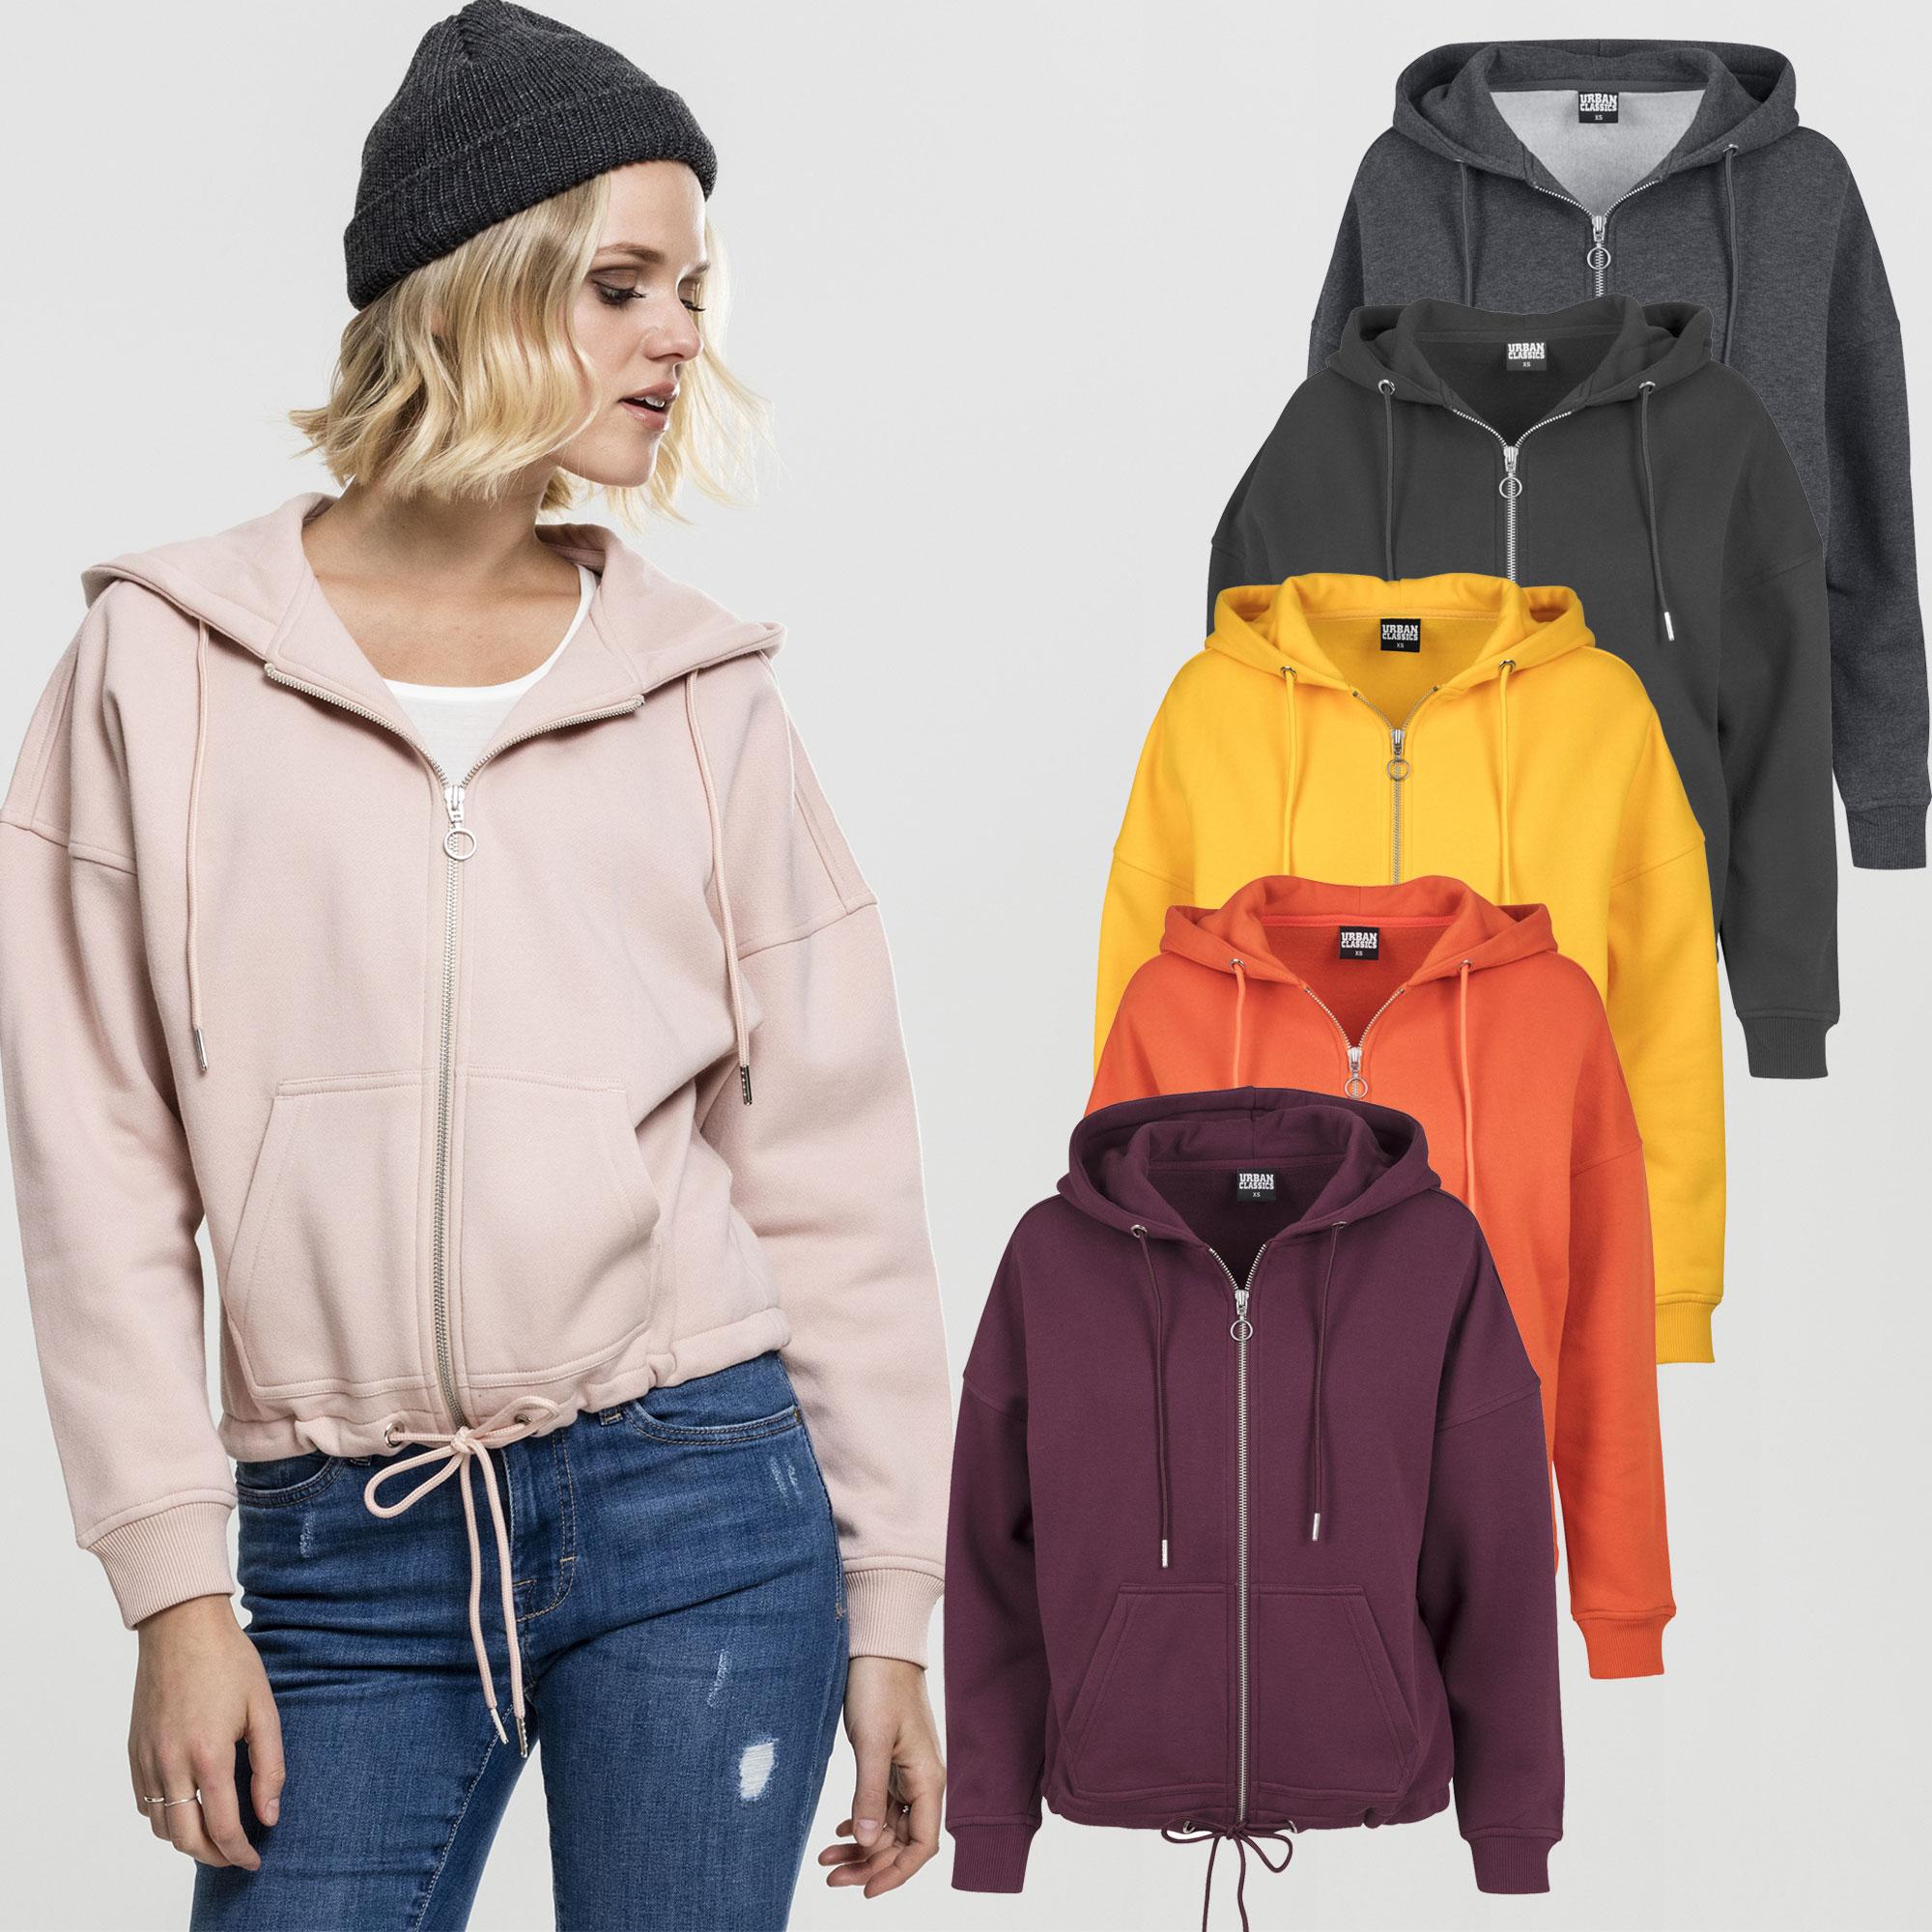 Classics Women's Details Hoody About Ladies Kimono Sweat Box Urban Zip Hoodie Tb1726 Jacket hCQtsrdx